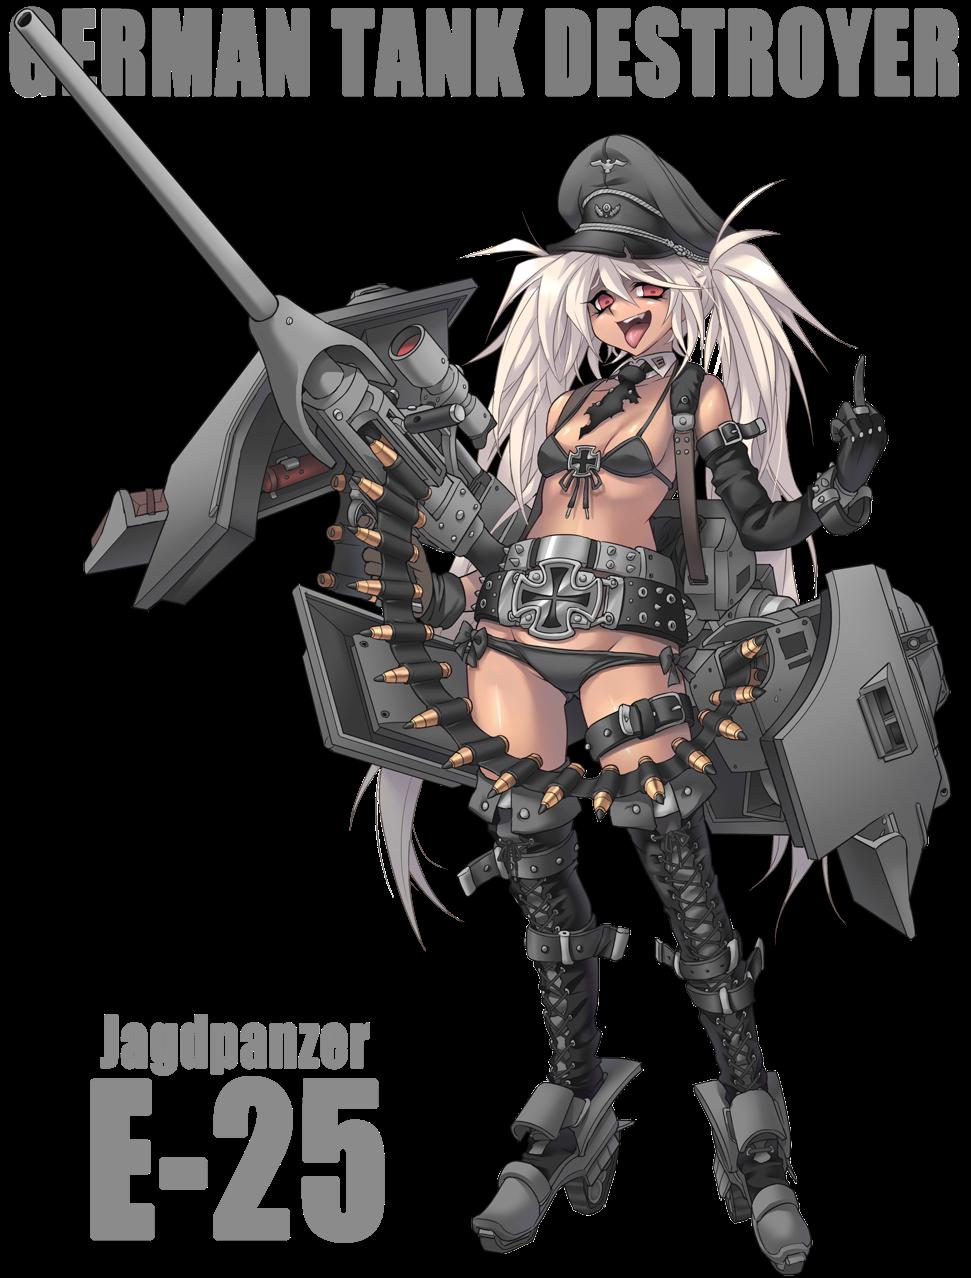 Pin By Felix Da Hellcat On Illustration Graphics Anime Military Anime Art Girl Anime Tank